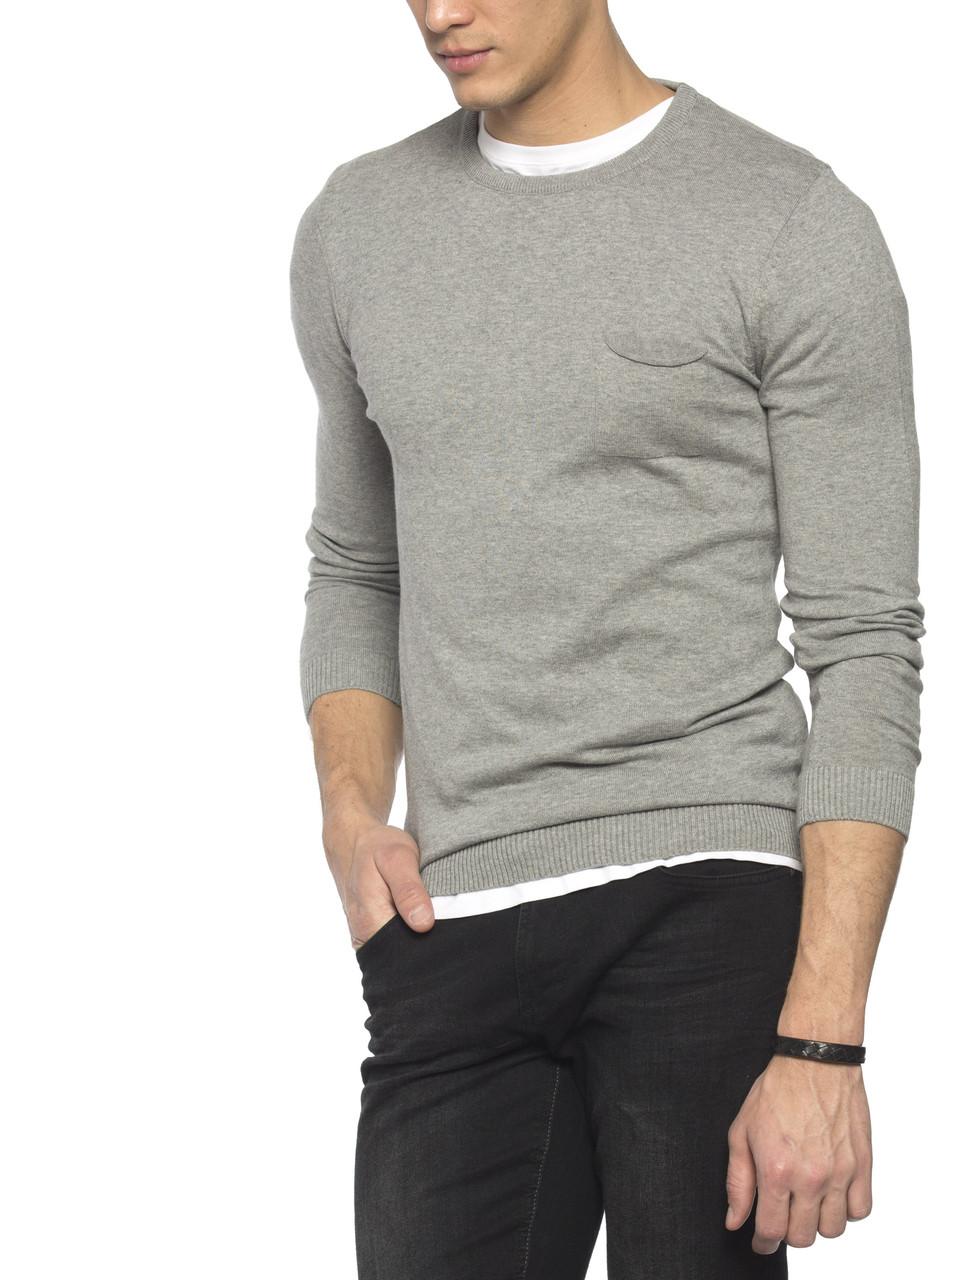 Мужской свитер LC Waikiki светло-серого цвета с карманом на груди, фото 1